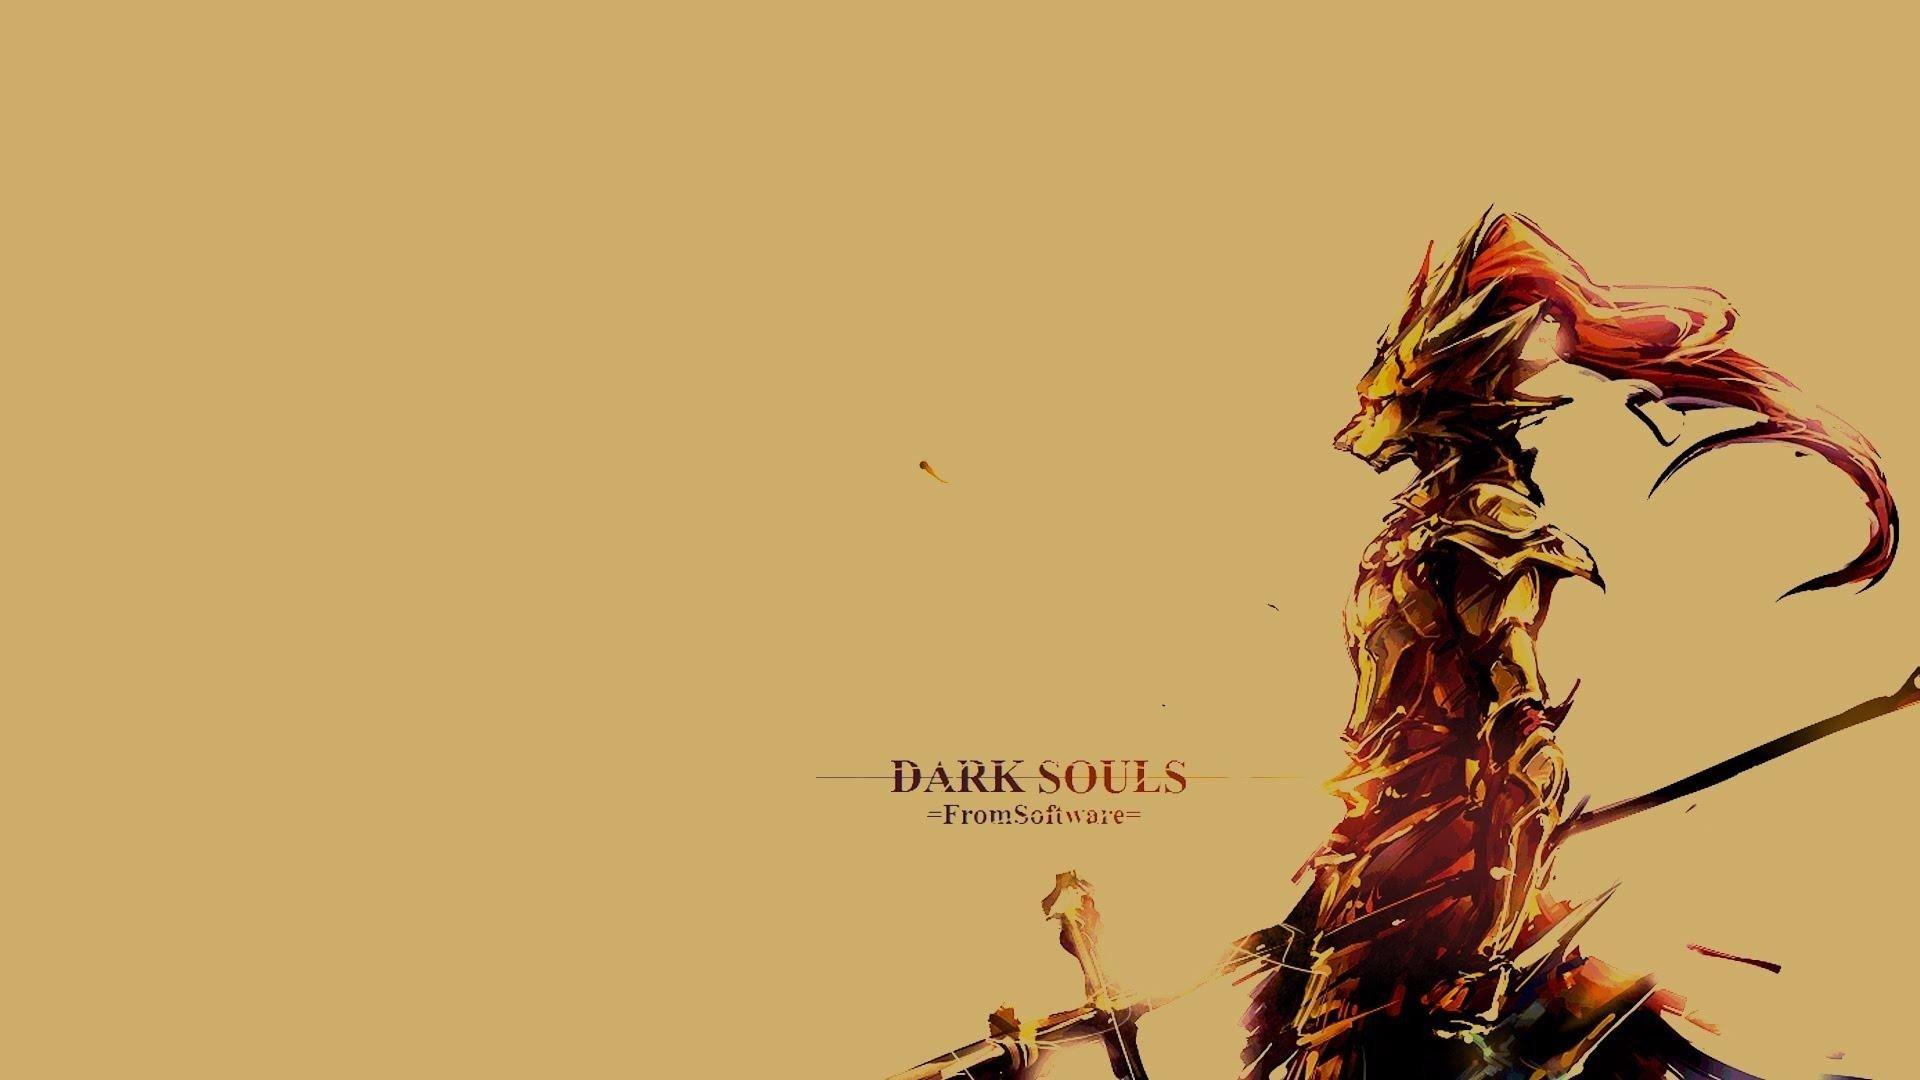 Dark Souls Fantasy Armor Hd Wallpapers Desktop And Mobile Images Photos